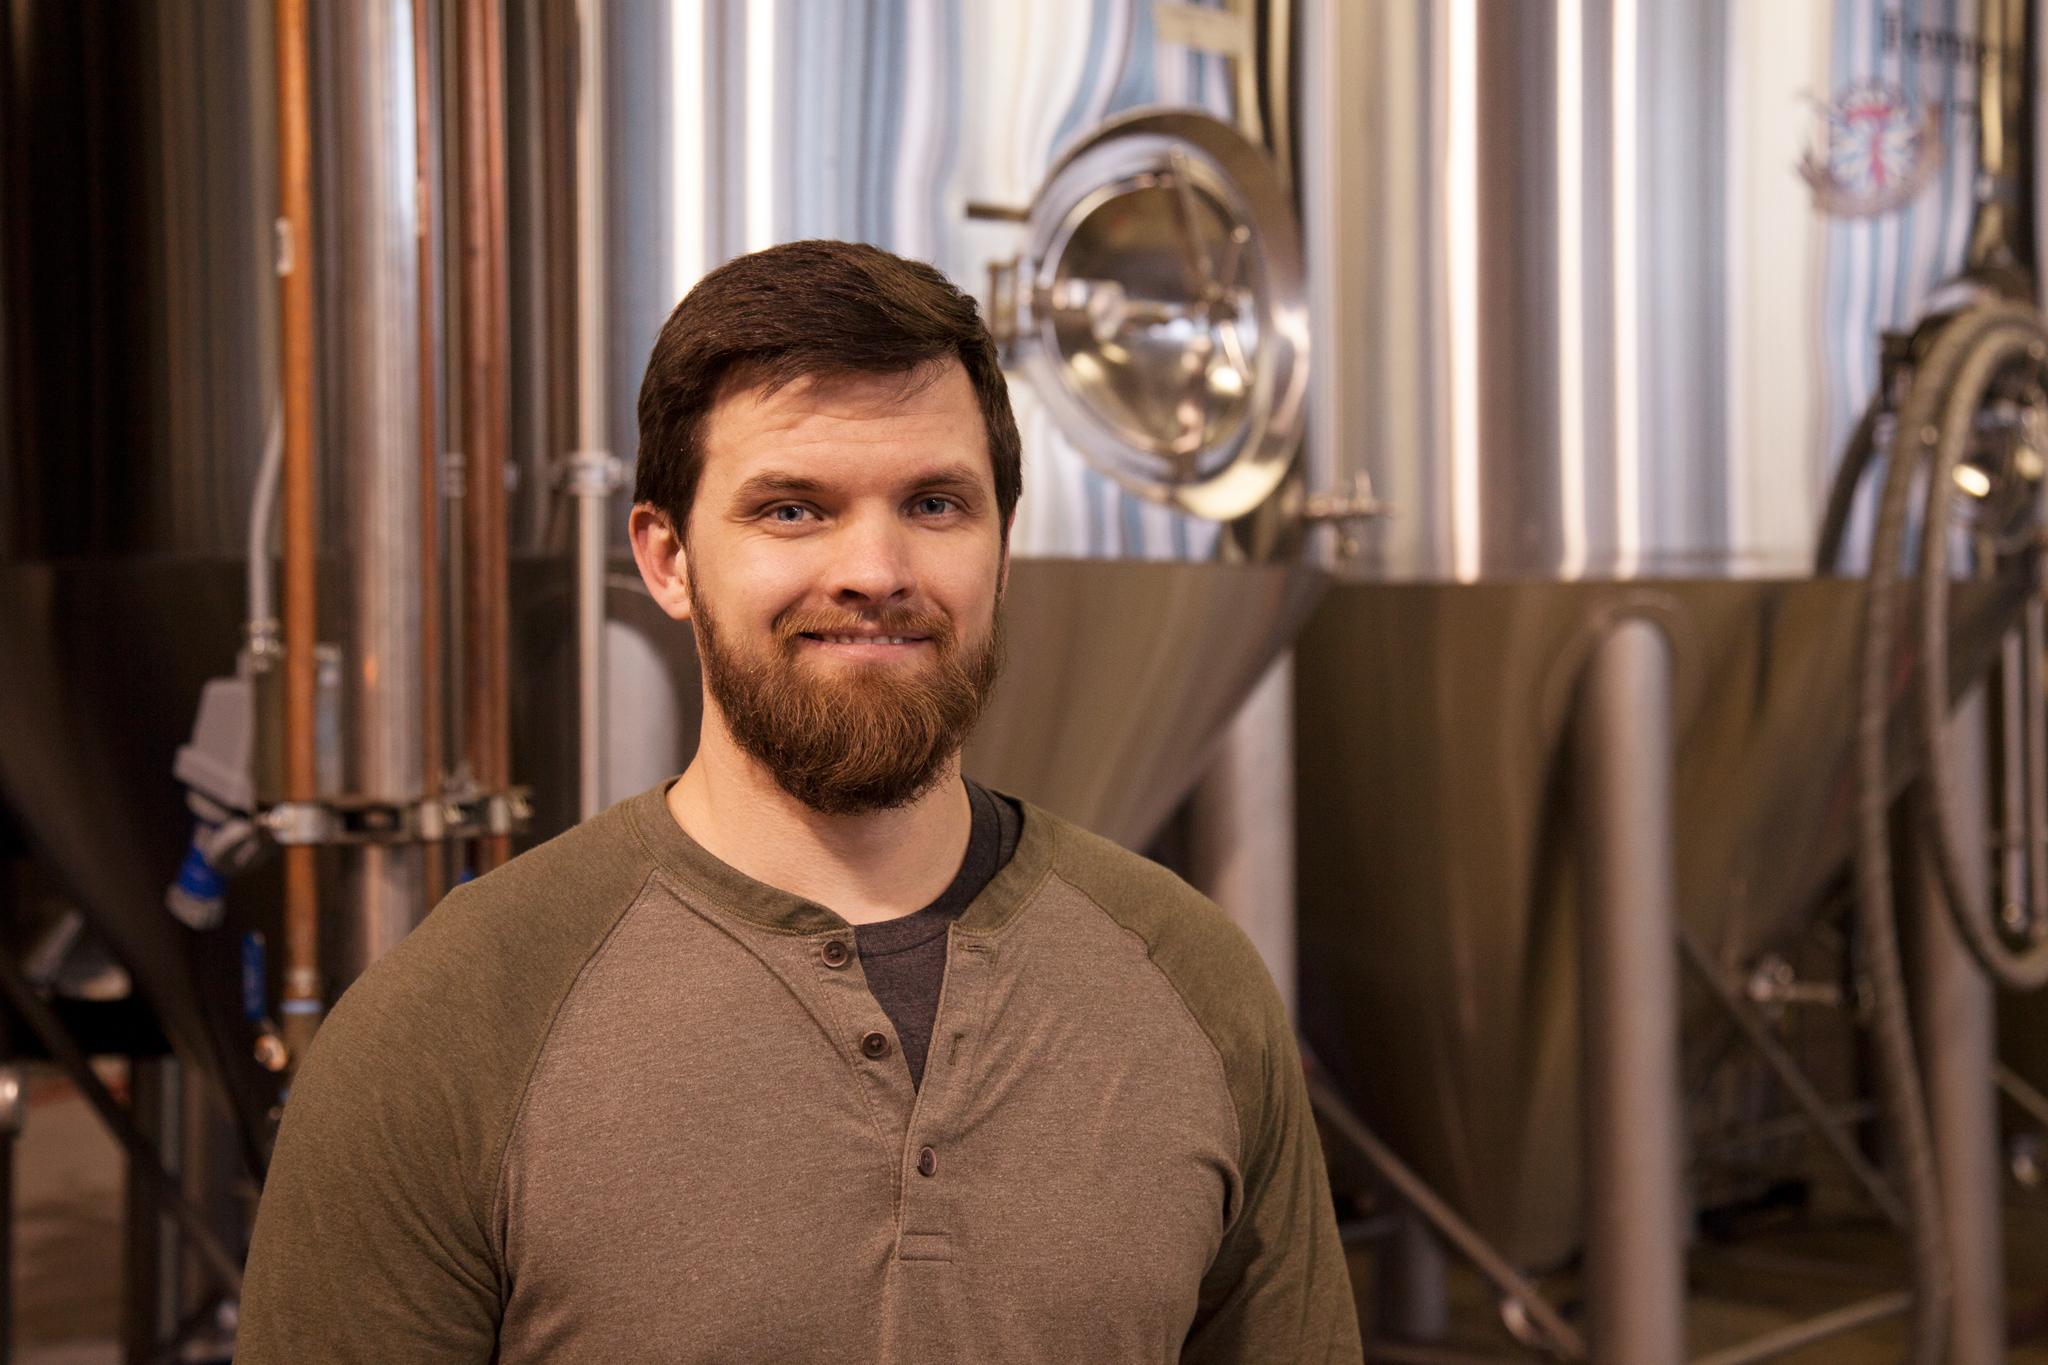 Meet the Instructors: Trevor Nichol, Mastering Beer Styles